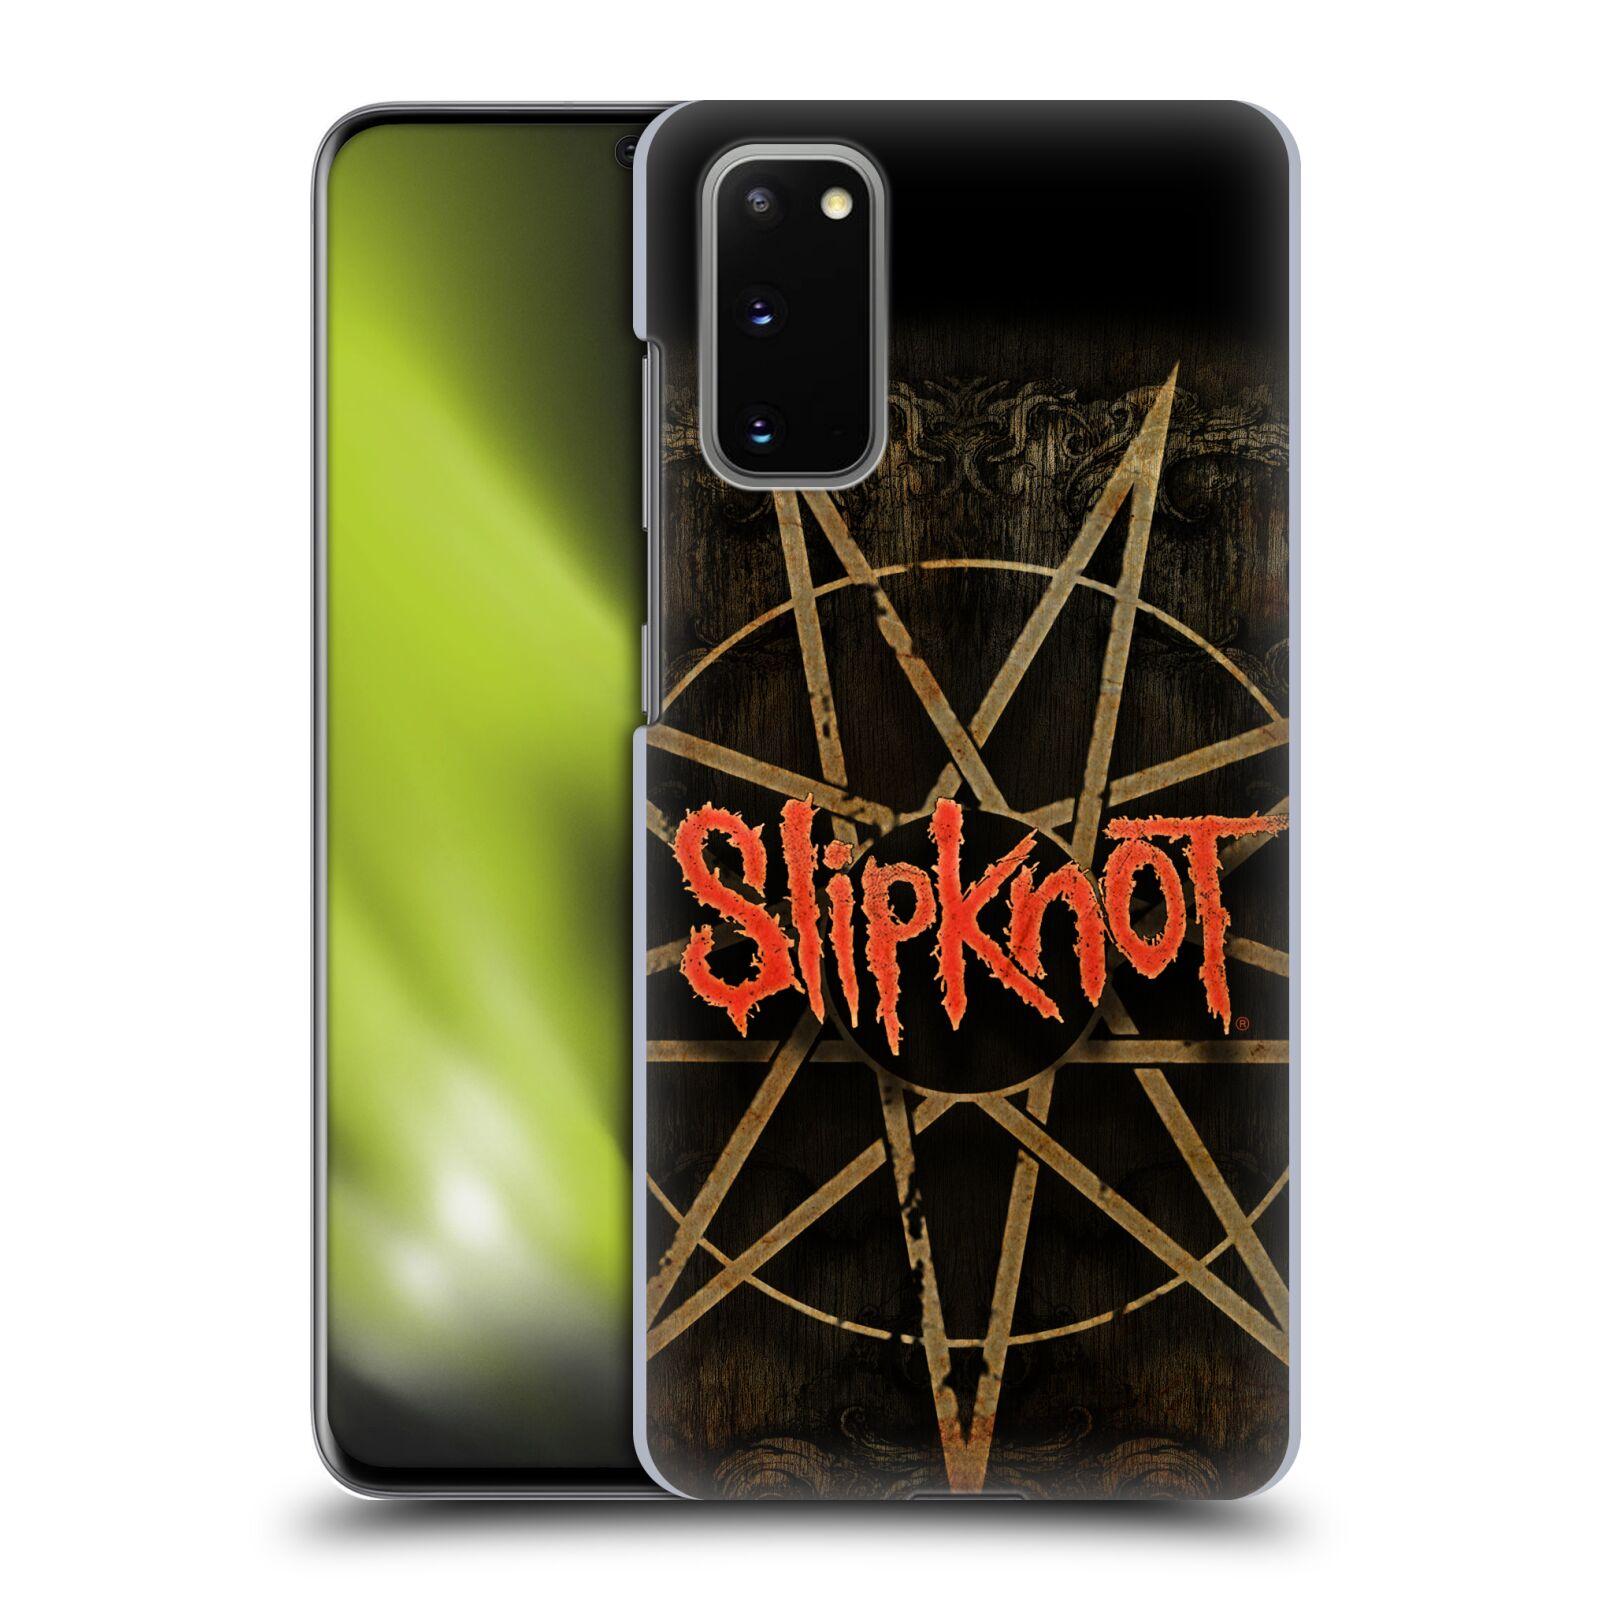 Plastové pouzdro na mobil Samsung Galaxy S20 - Head Case - Slipknot - Znak